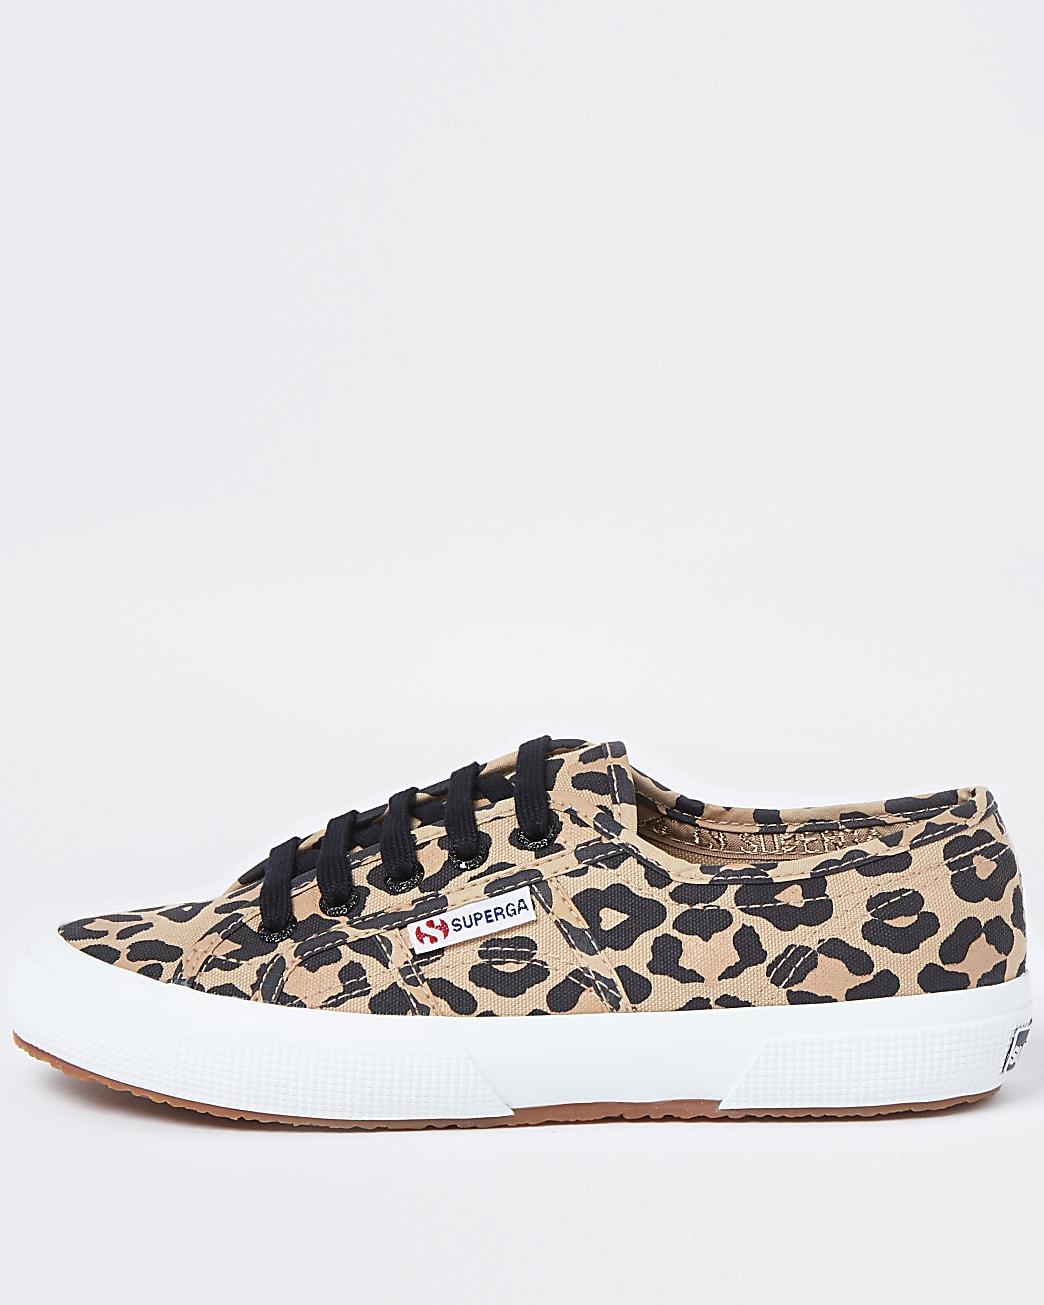 Superga brown leopard classic canvas trainers